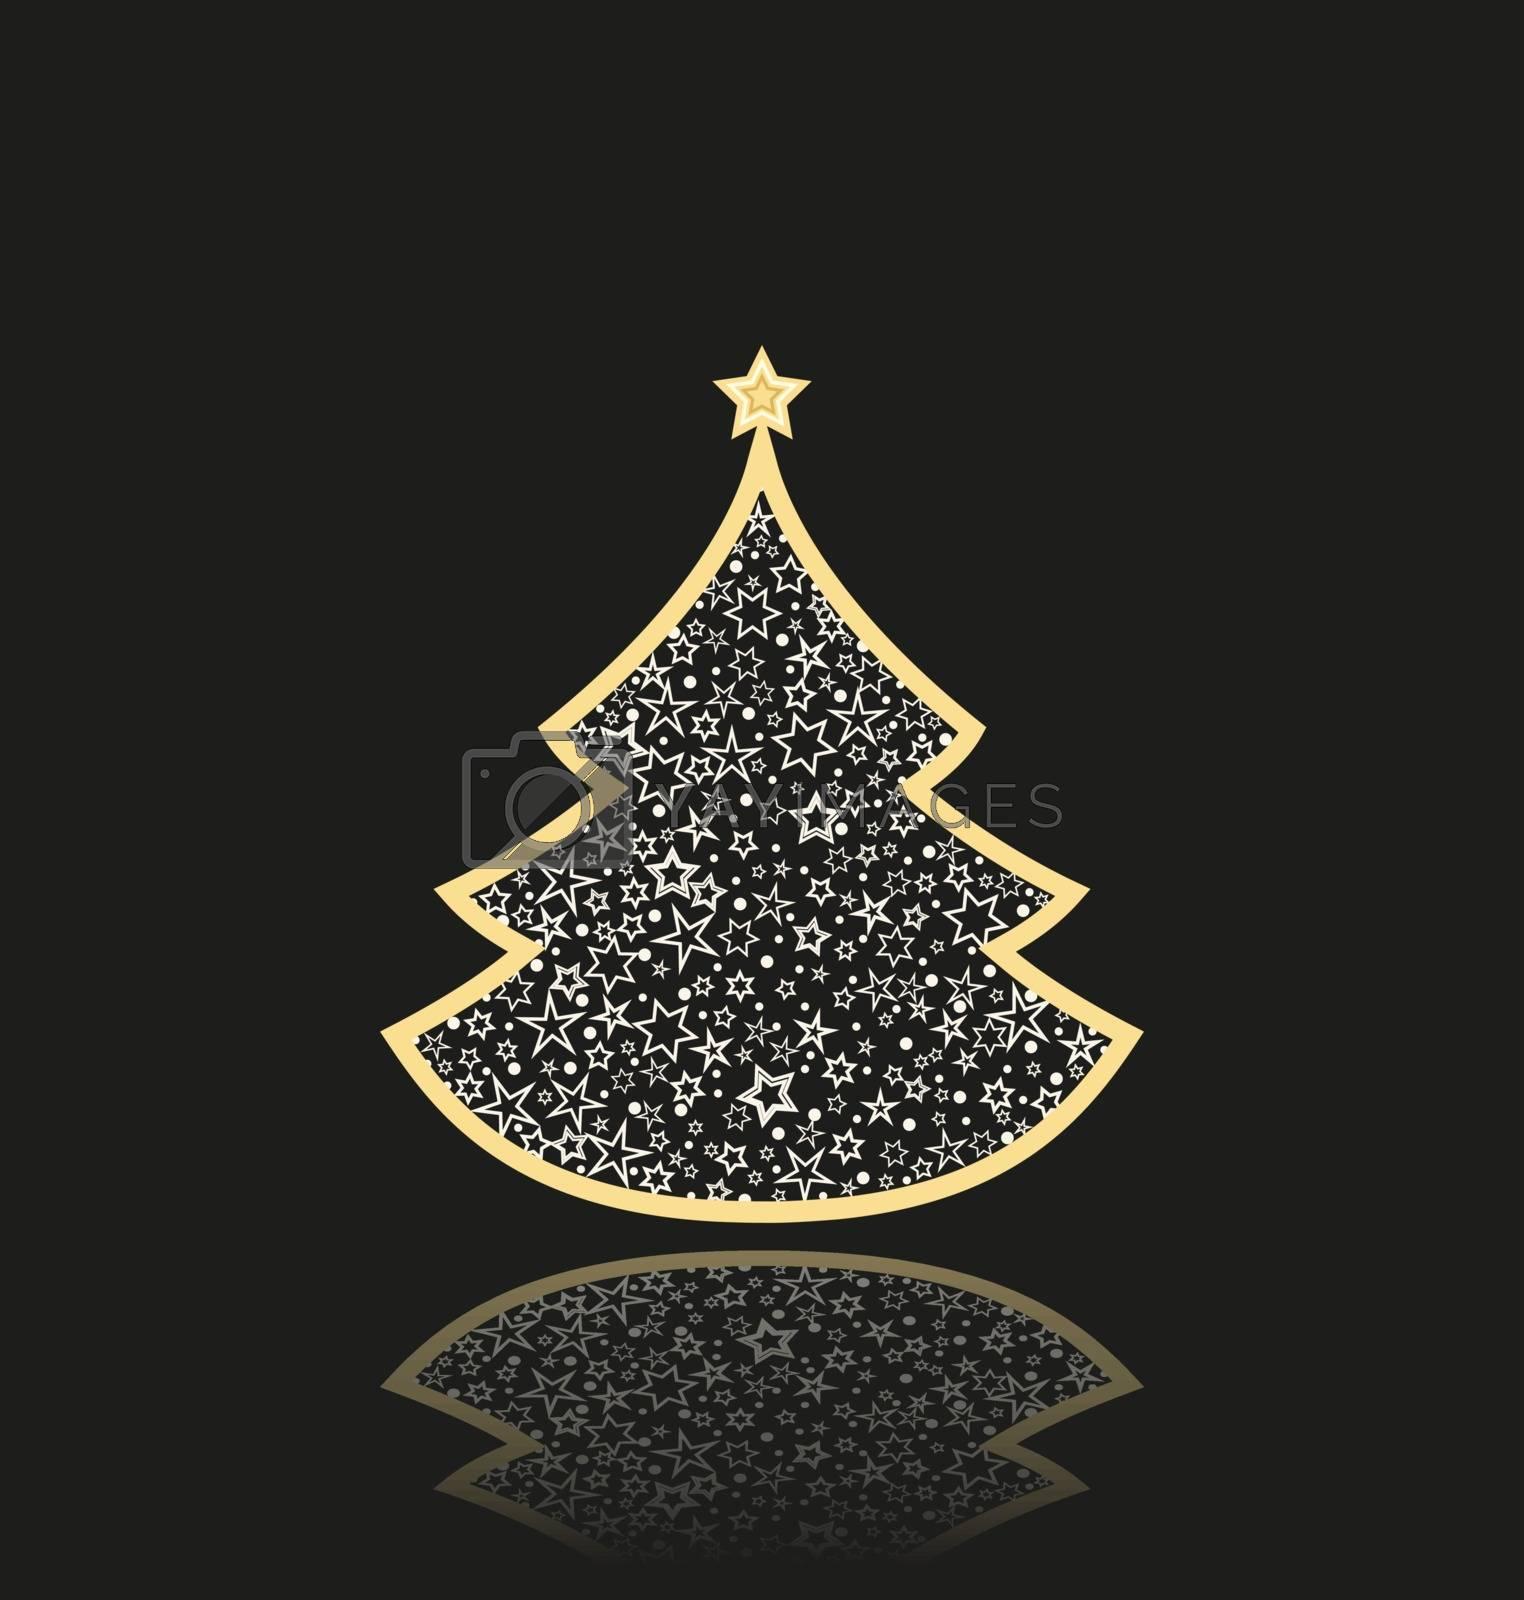 Vector illustration abstract golden christmas tree on black background. Golden light decoration. Christmas tree as symbol